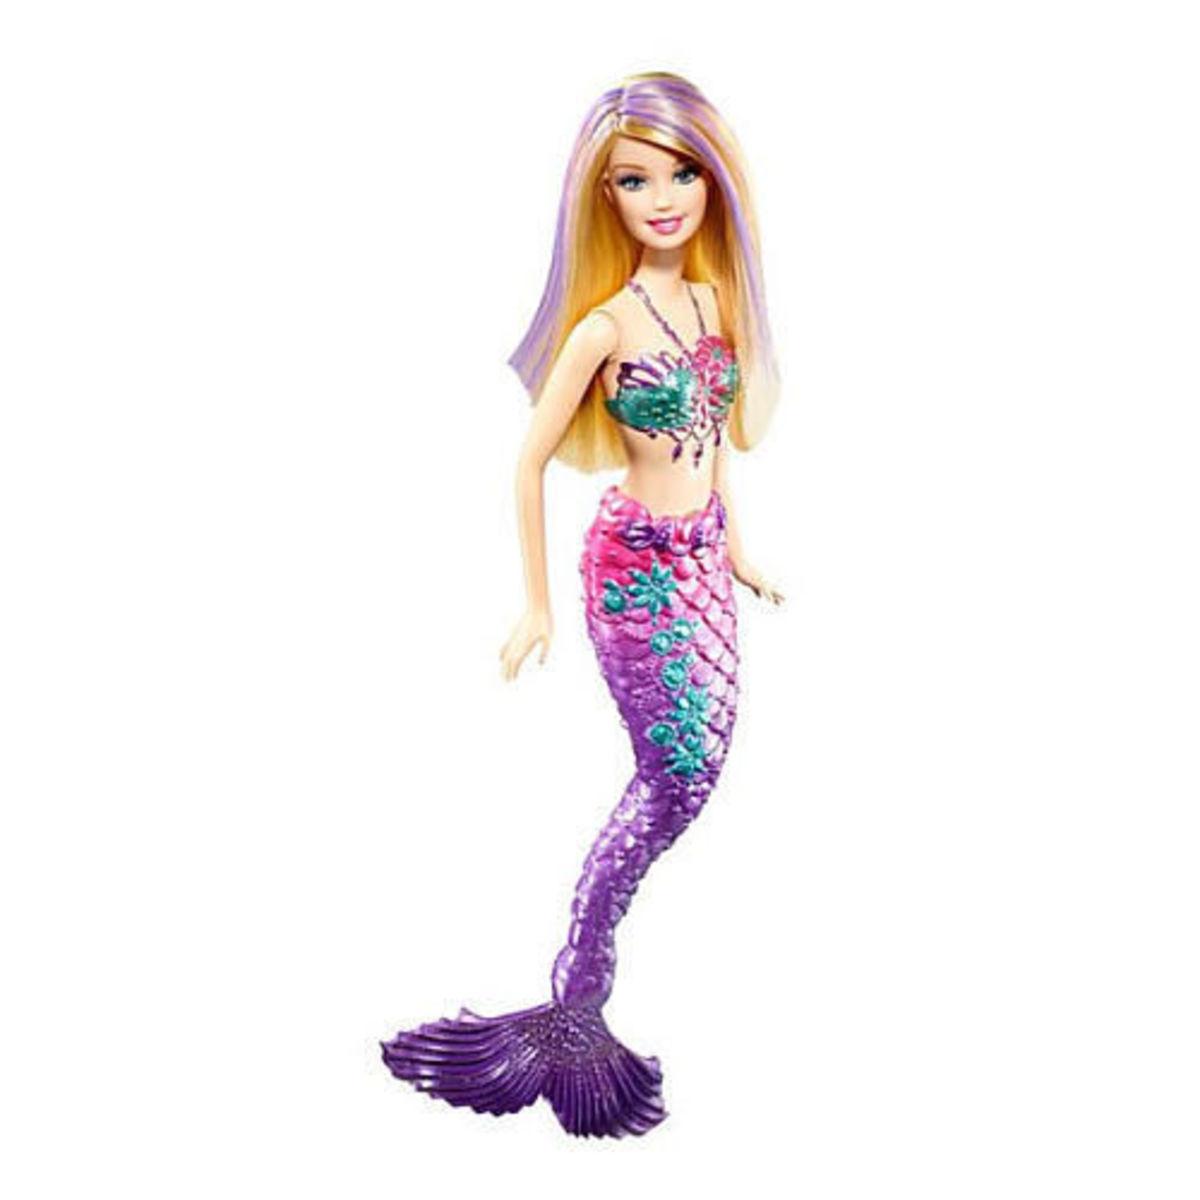 Purple Mermaid Barbie in purple and pink fins and long blond hair